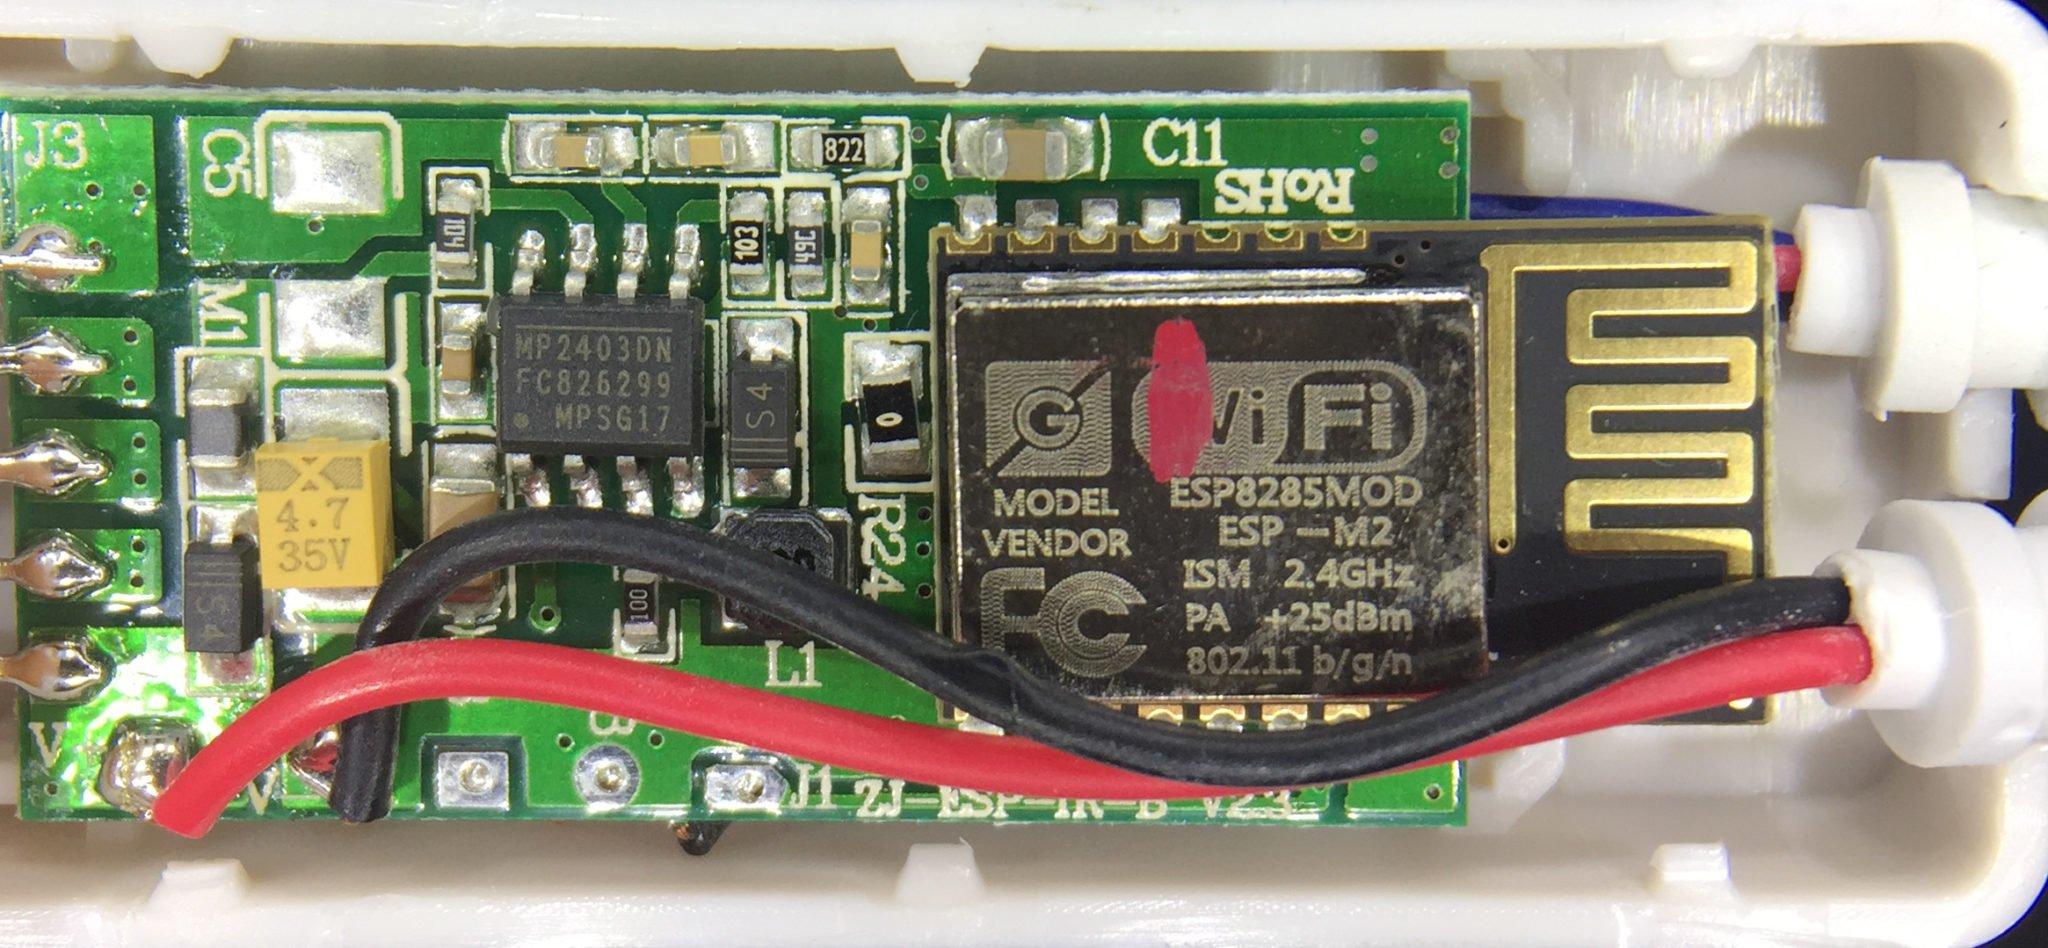 Multi-zone WiFi LED Lighting (Part 2b – WiFi LED Controller